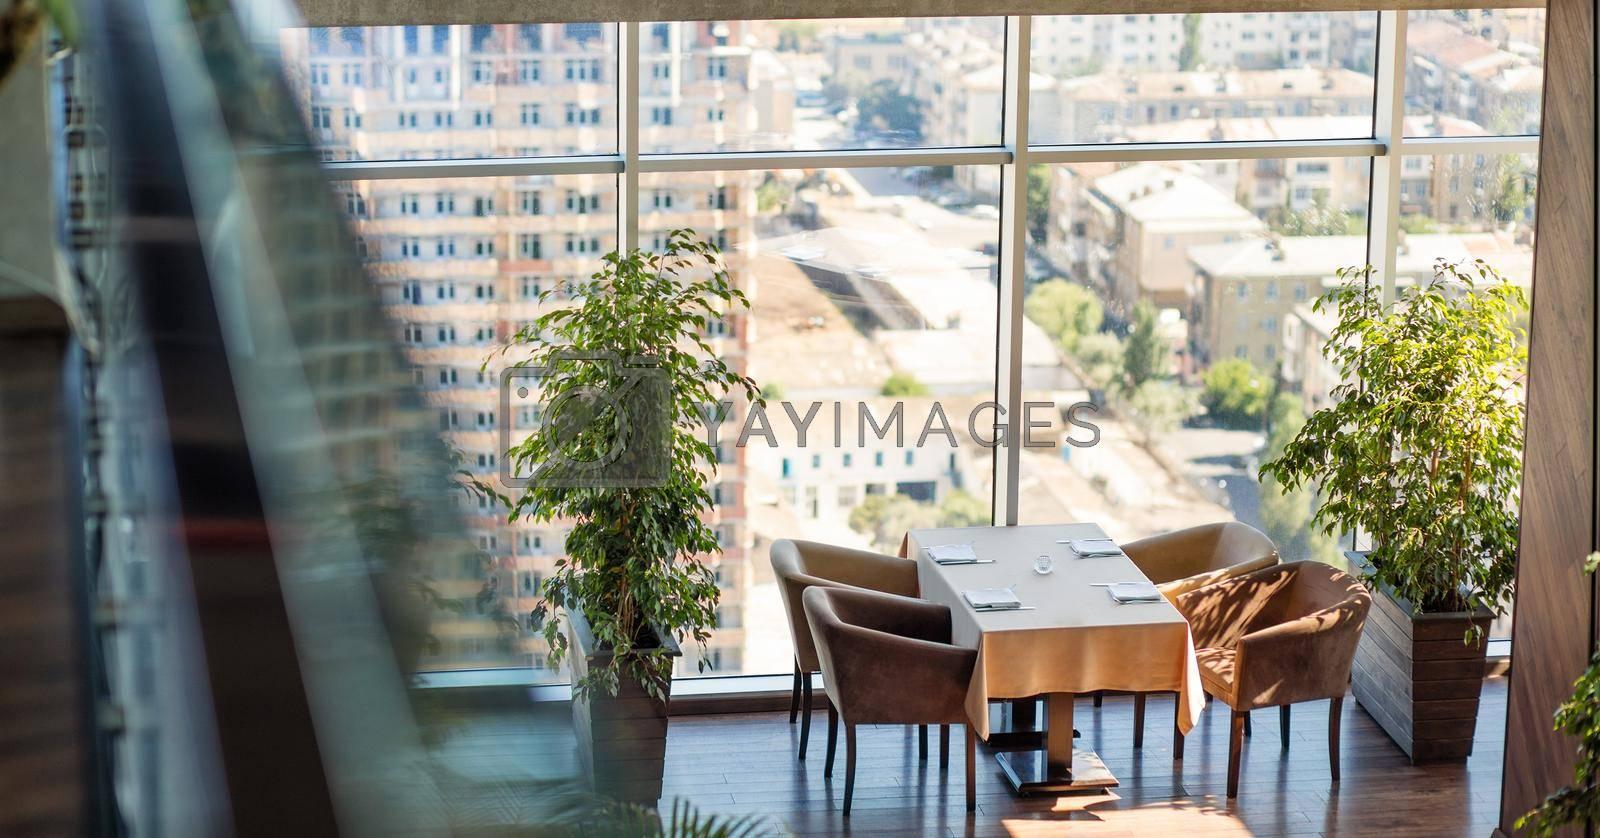 Luxury restaurant interior with city view